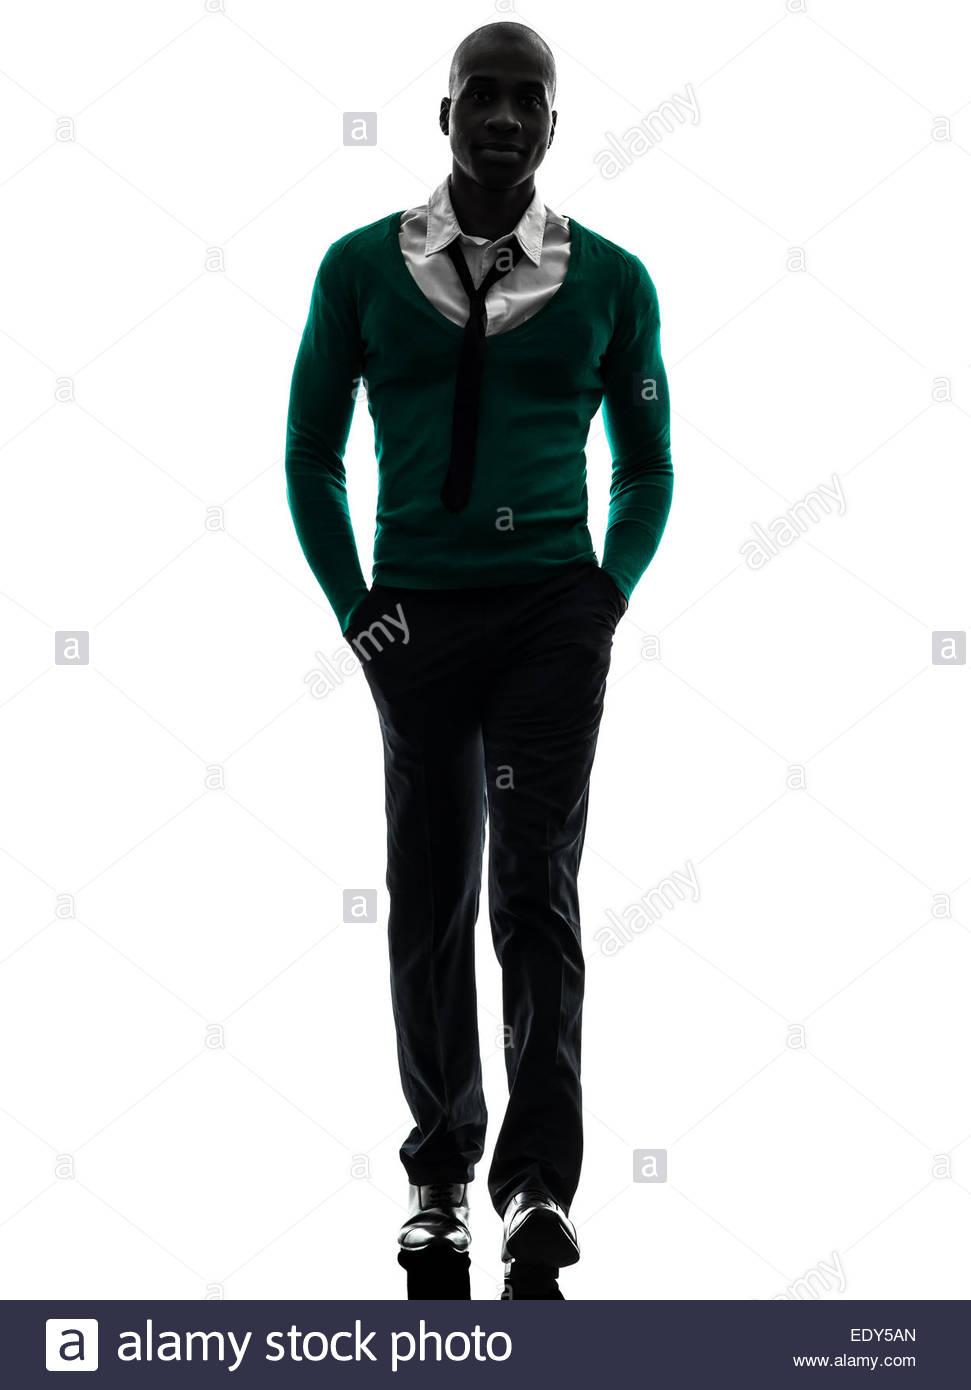 971x1390 One African Black Man Walking In Silhouette Studio On White Stock